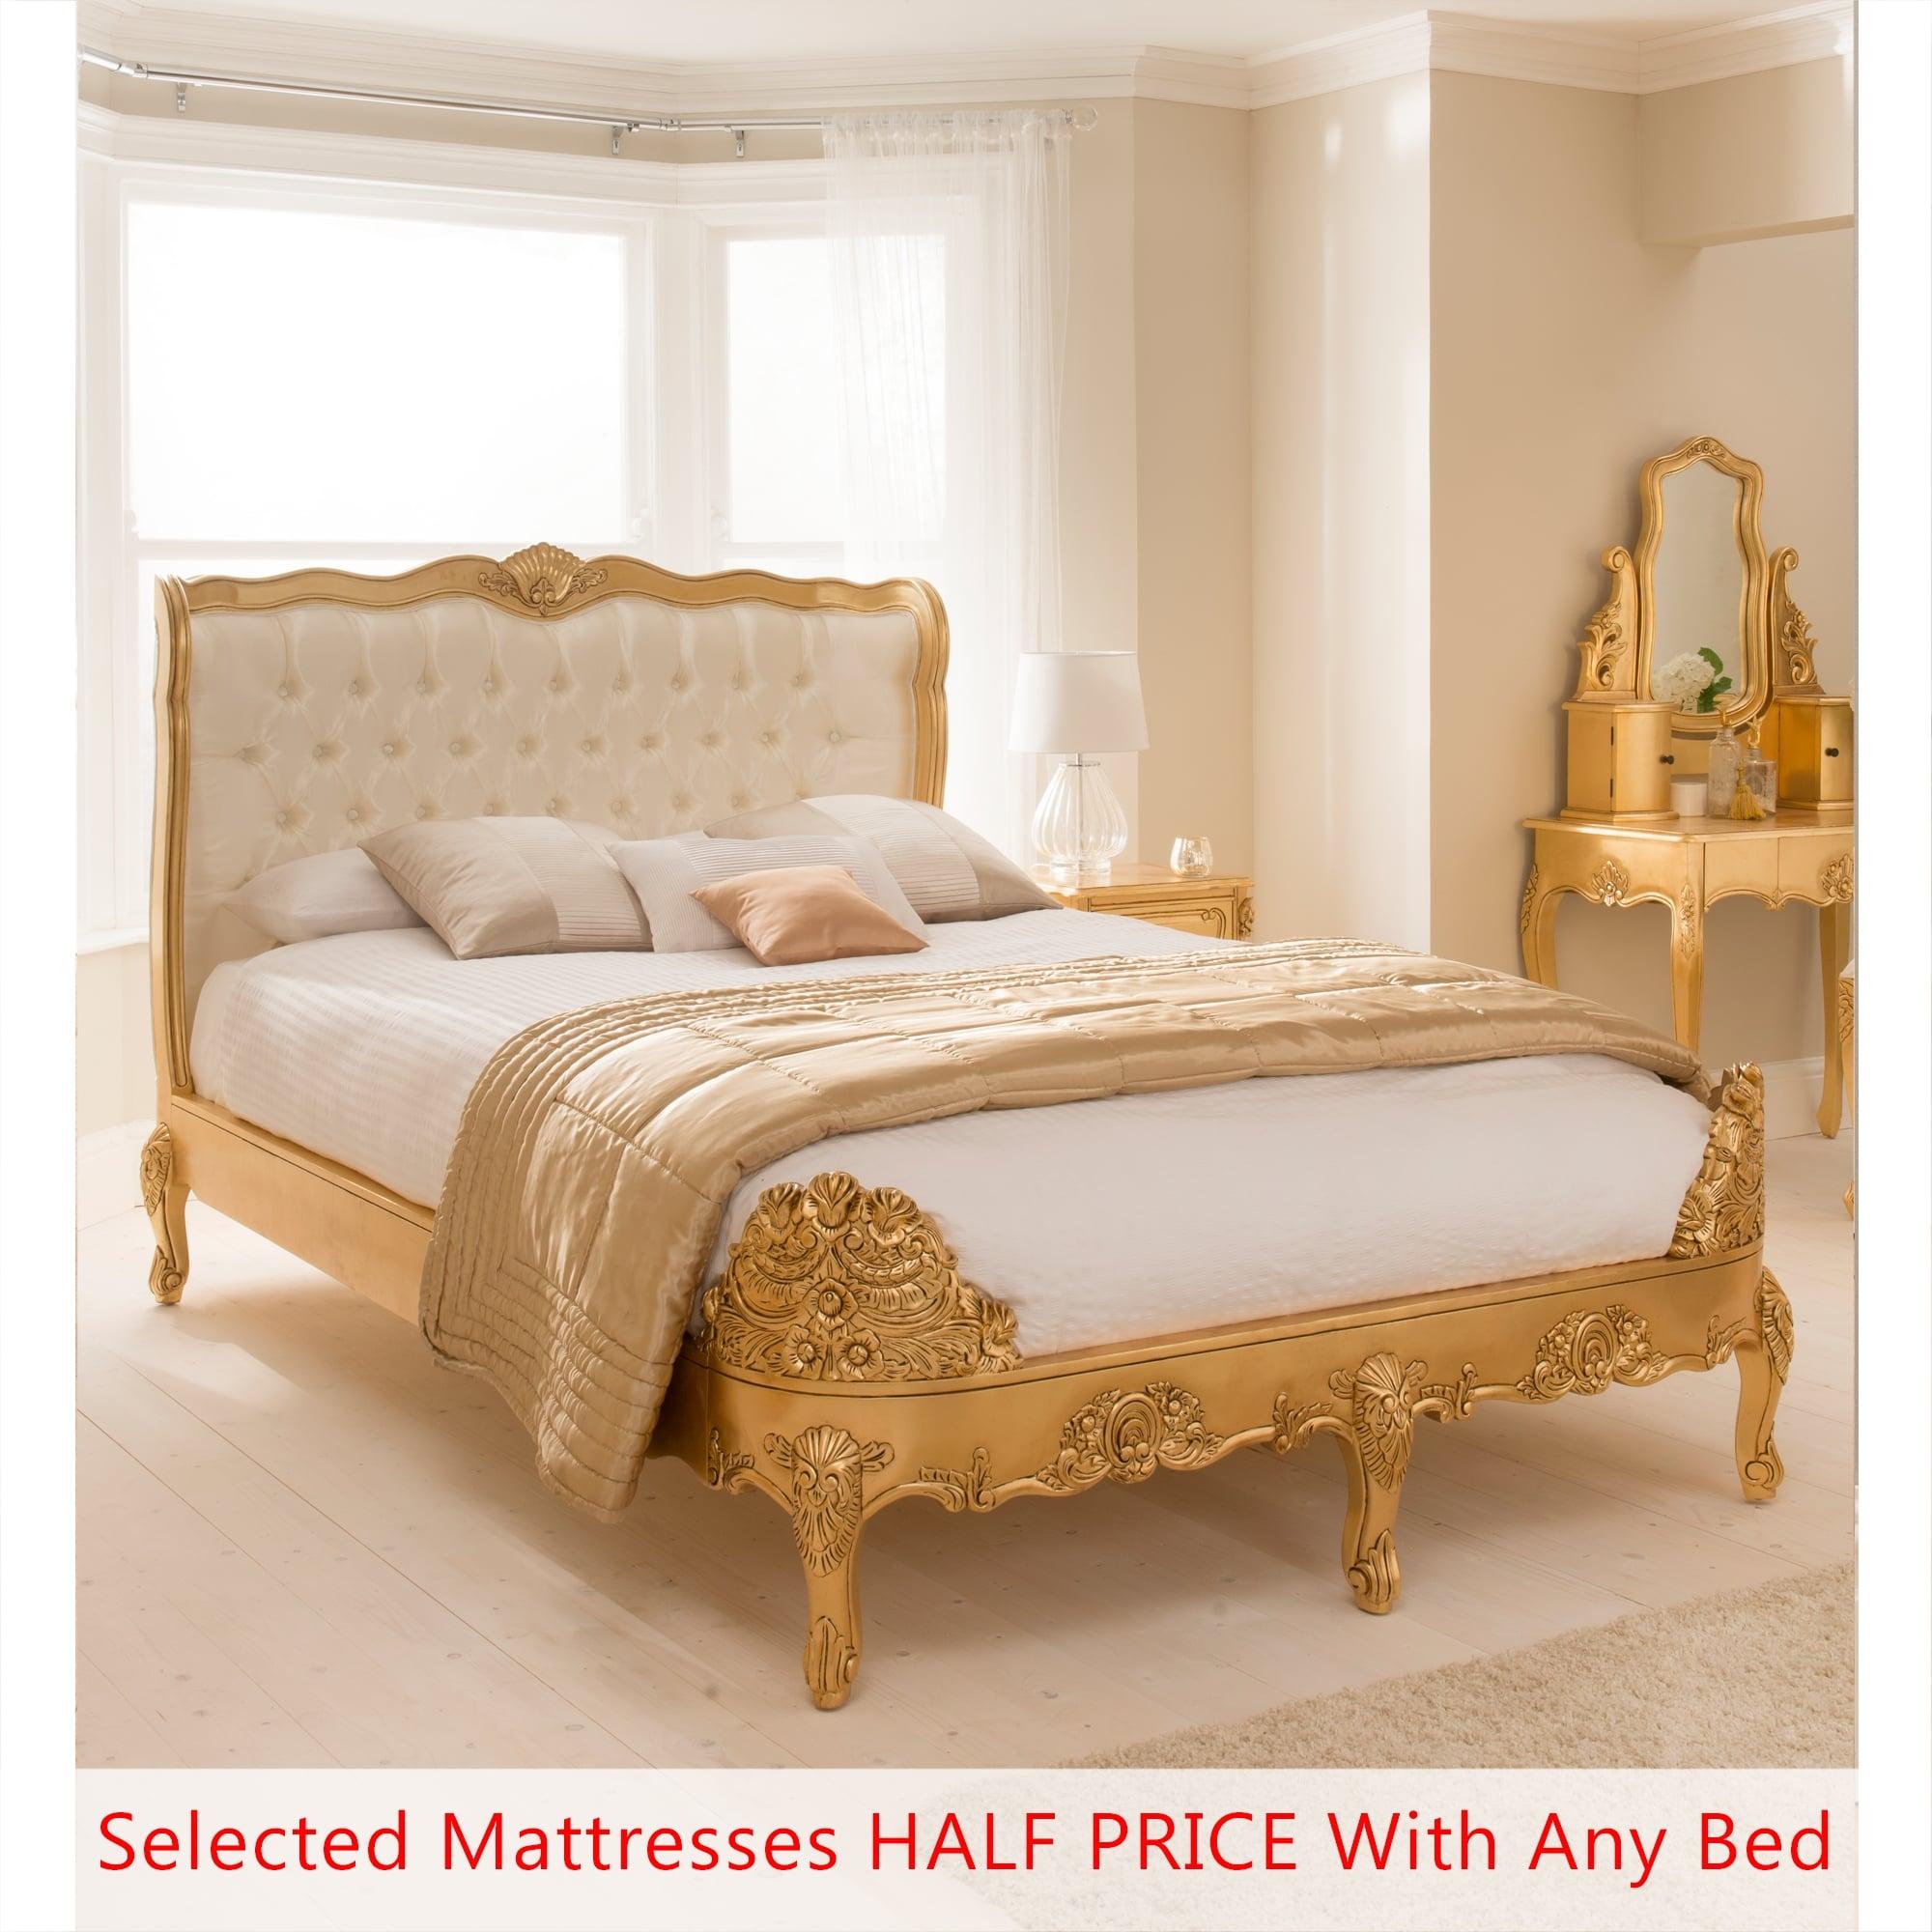 mattresses philosophy size sleep mattress king pin foam memory gel inch flexapedic by